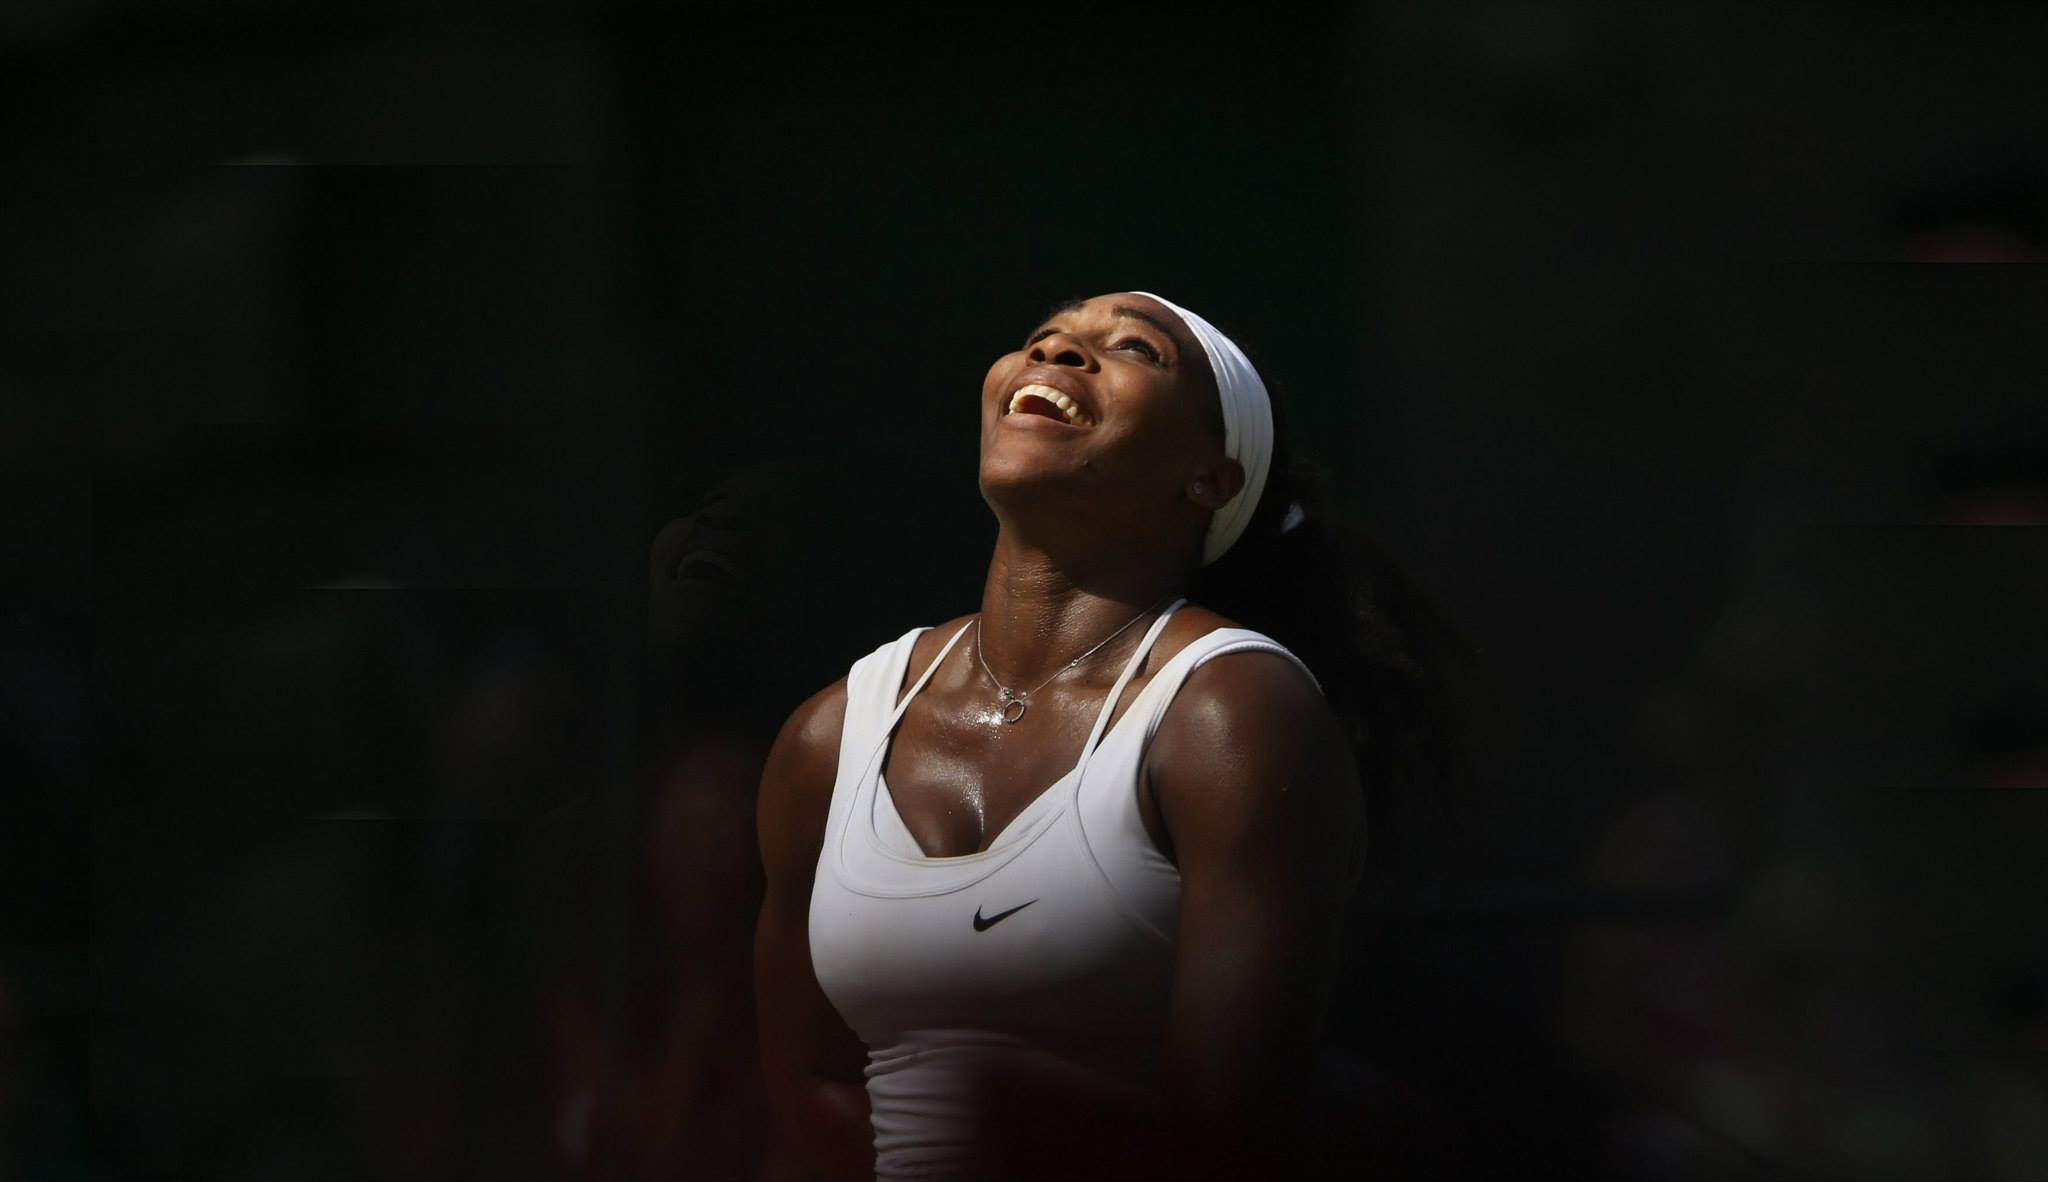 Serena After Winning 2015 Wimbledon Champion 21st